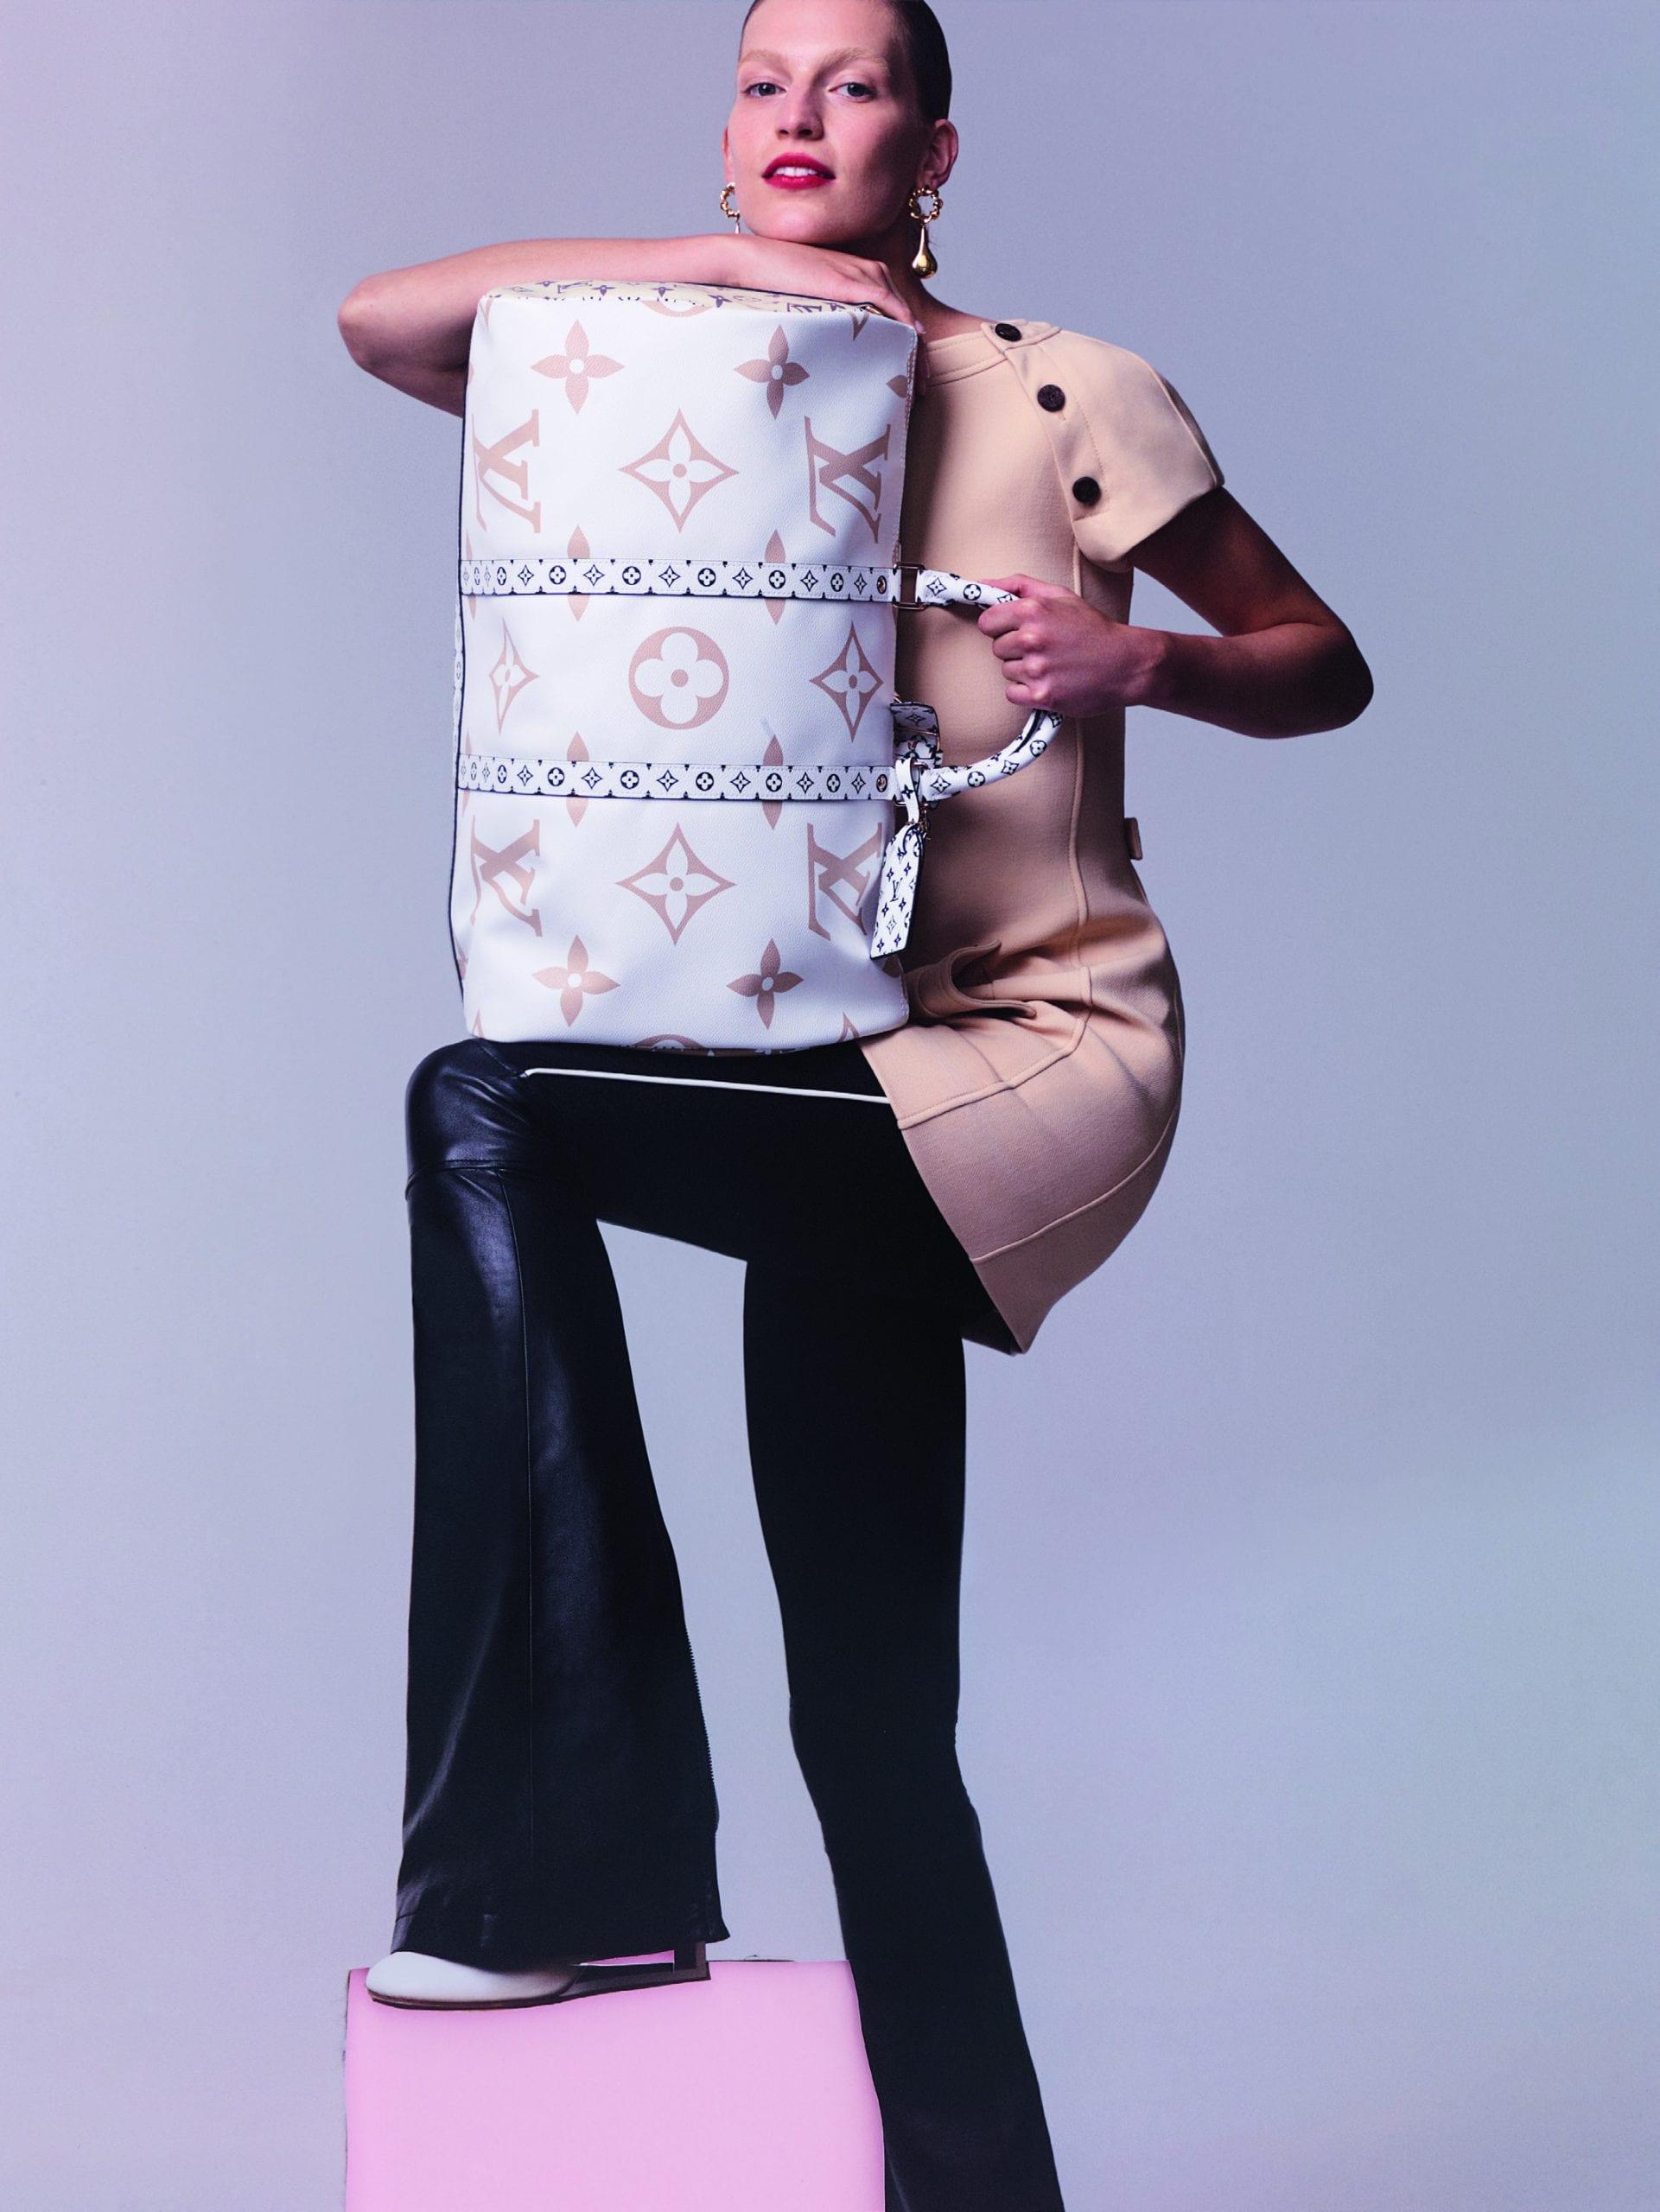 Linda Jefferyes Vogue Editorial - Heavyweights